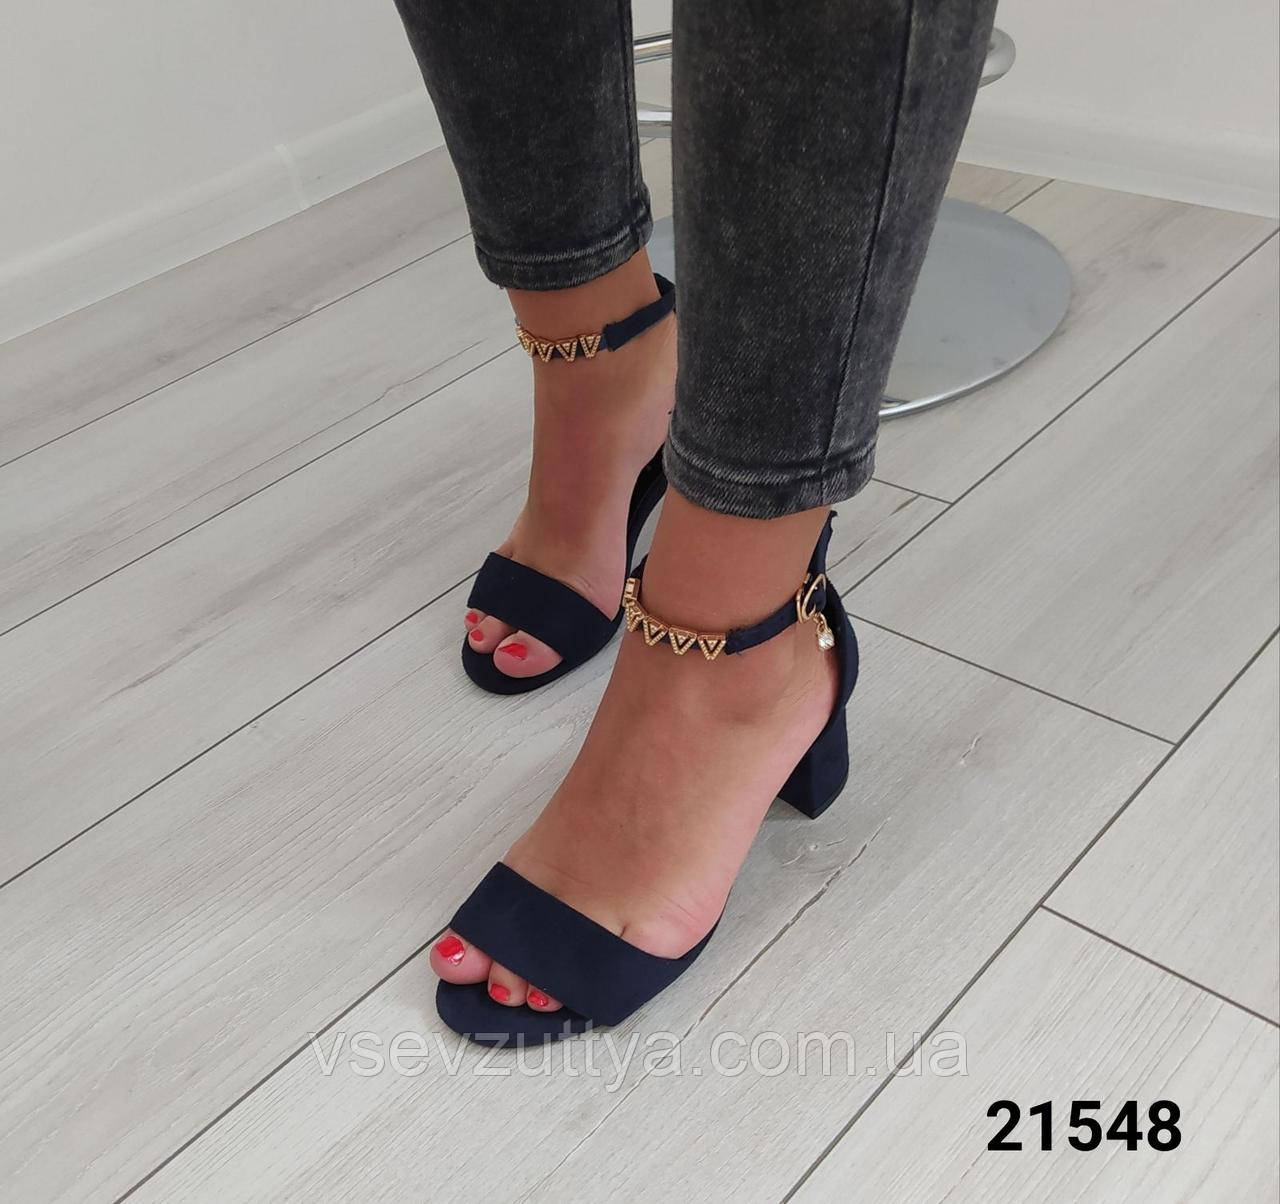 Босоножки женские на каблуке синие